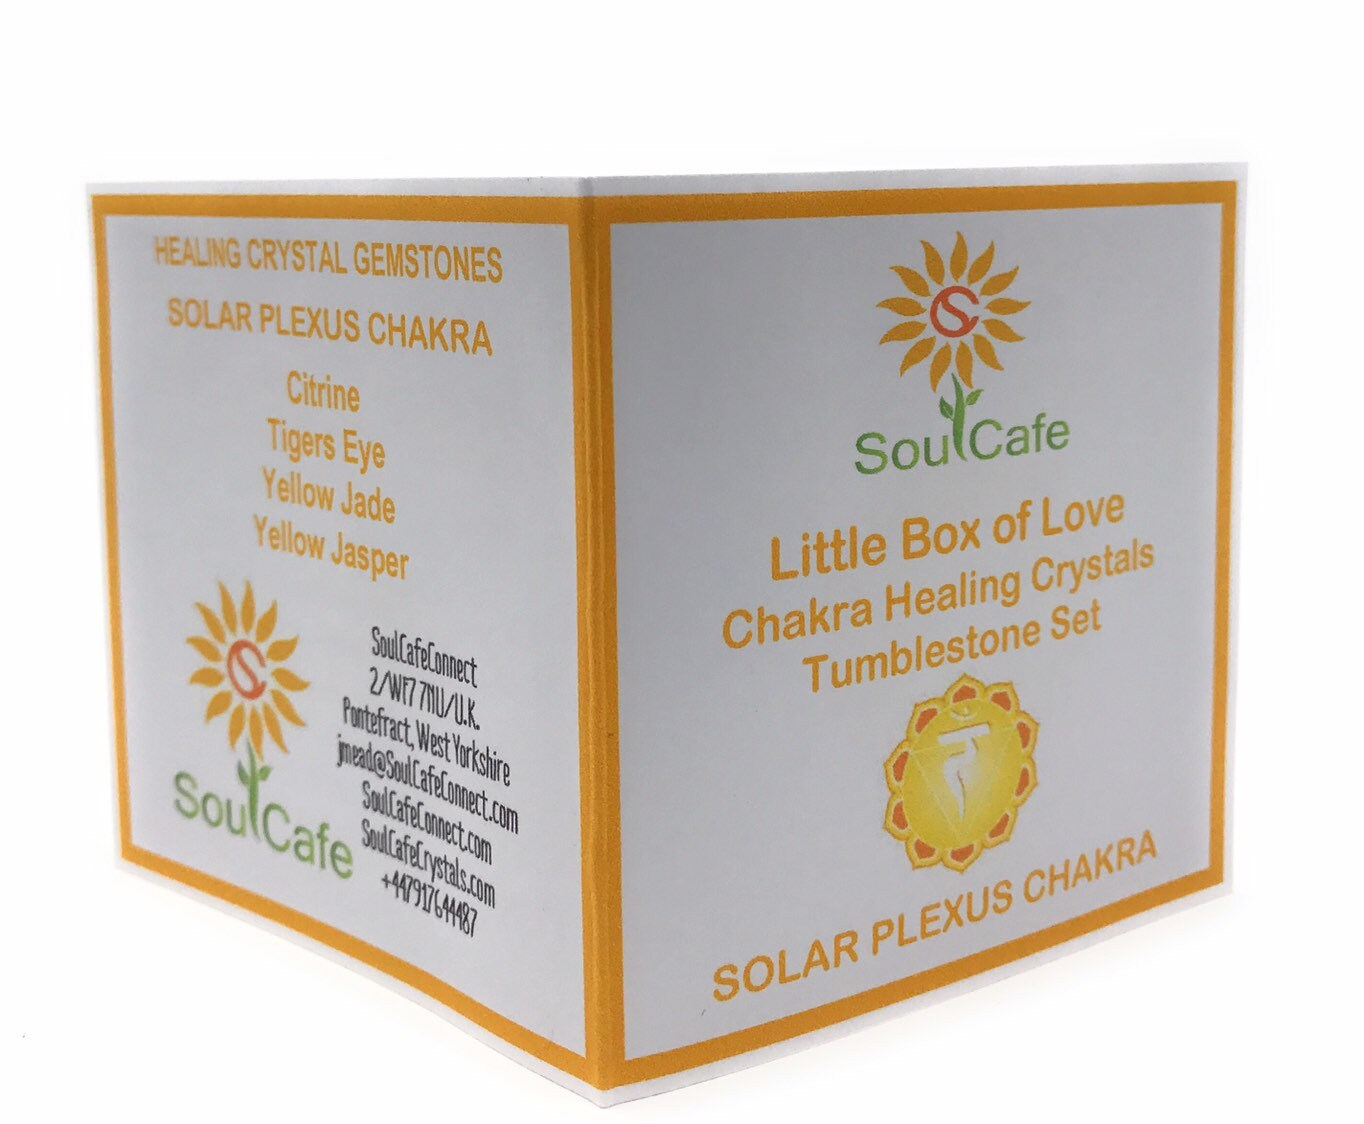 Solar Plexus Chakra Balancing Set - Healing Crystal